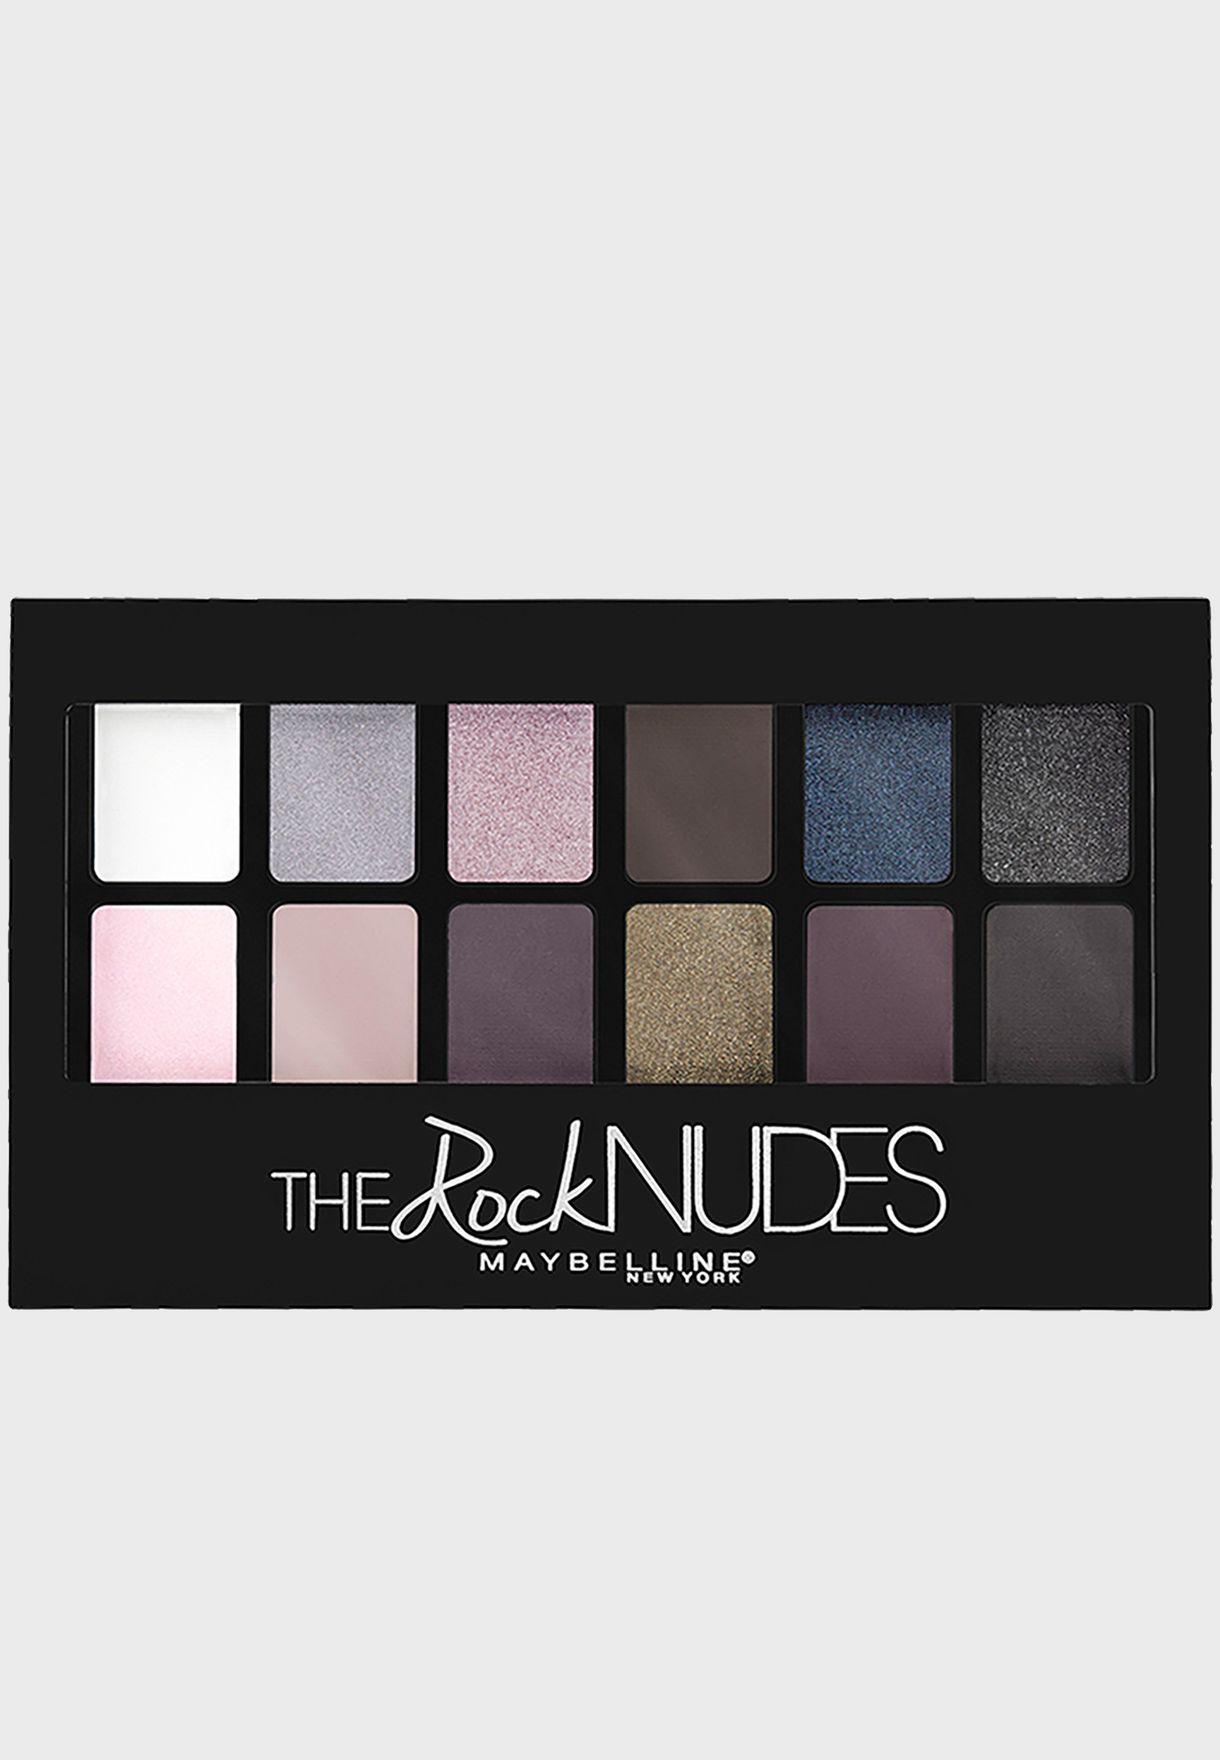 The Rock Nudes Eyeshadow Palette